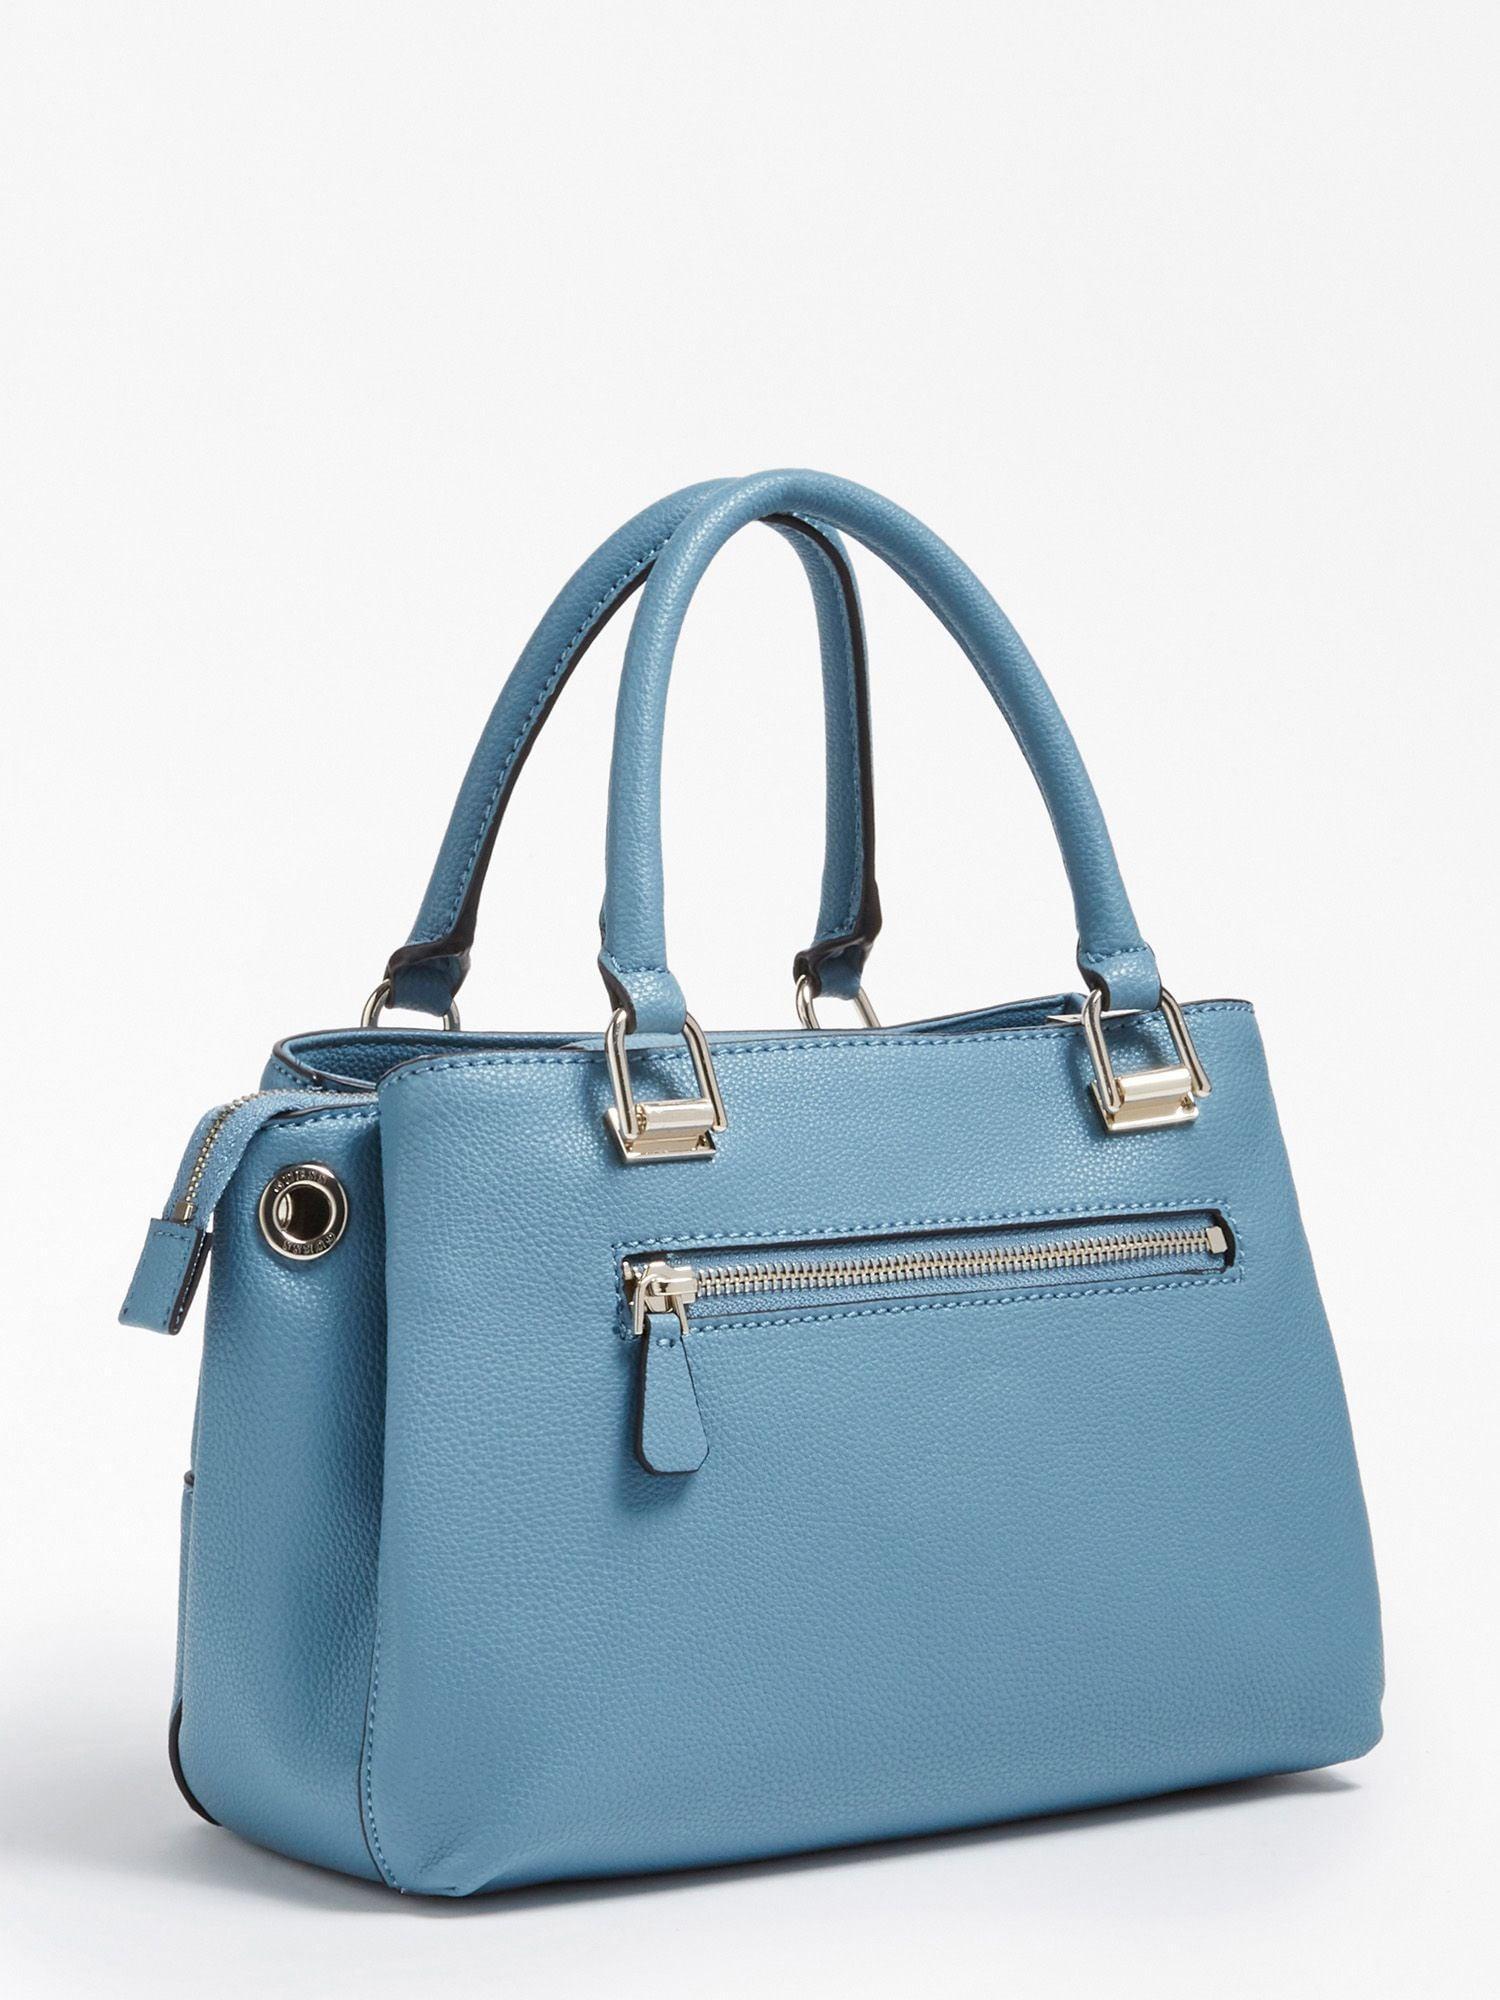 Guess Handtasche 'Lila' in Blau RHb5S